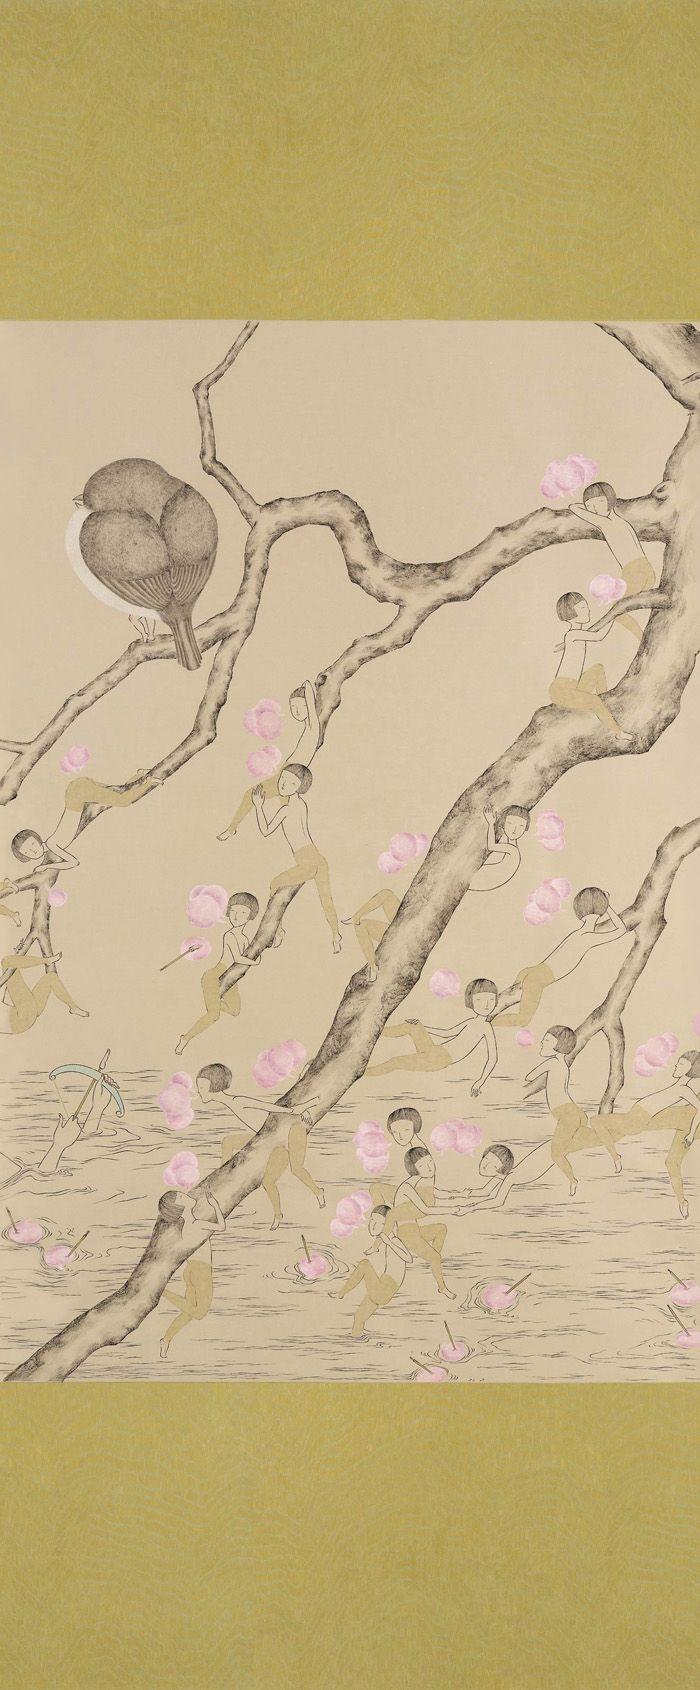 Leung Ka Yin - talking plums (detail)